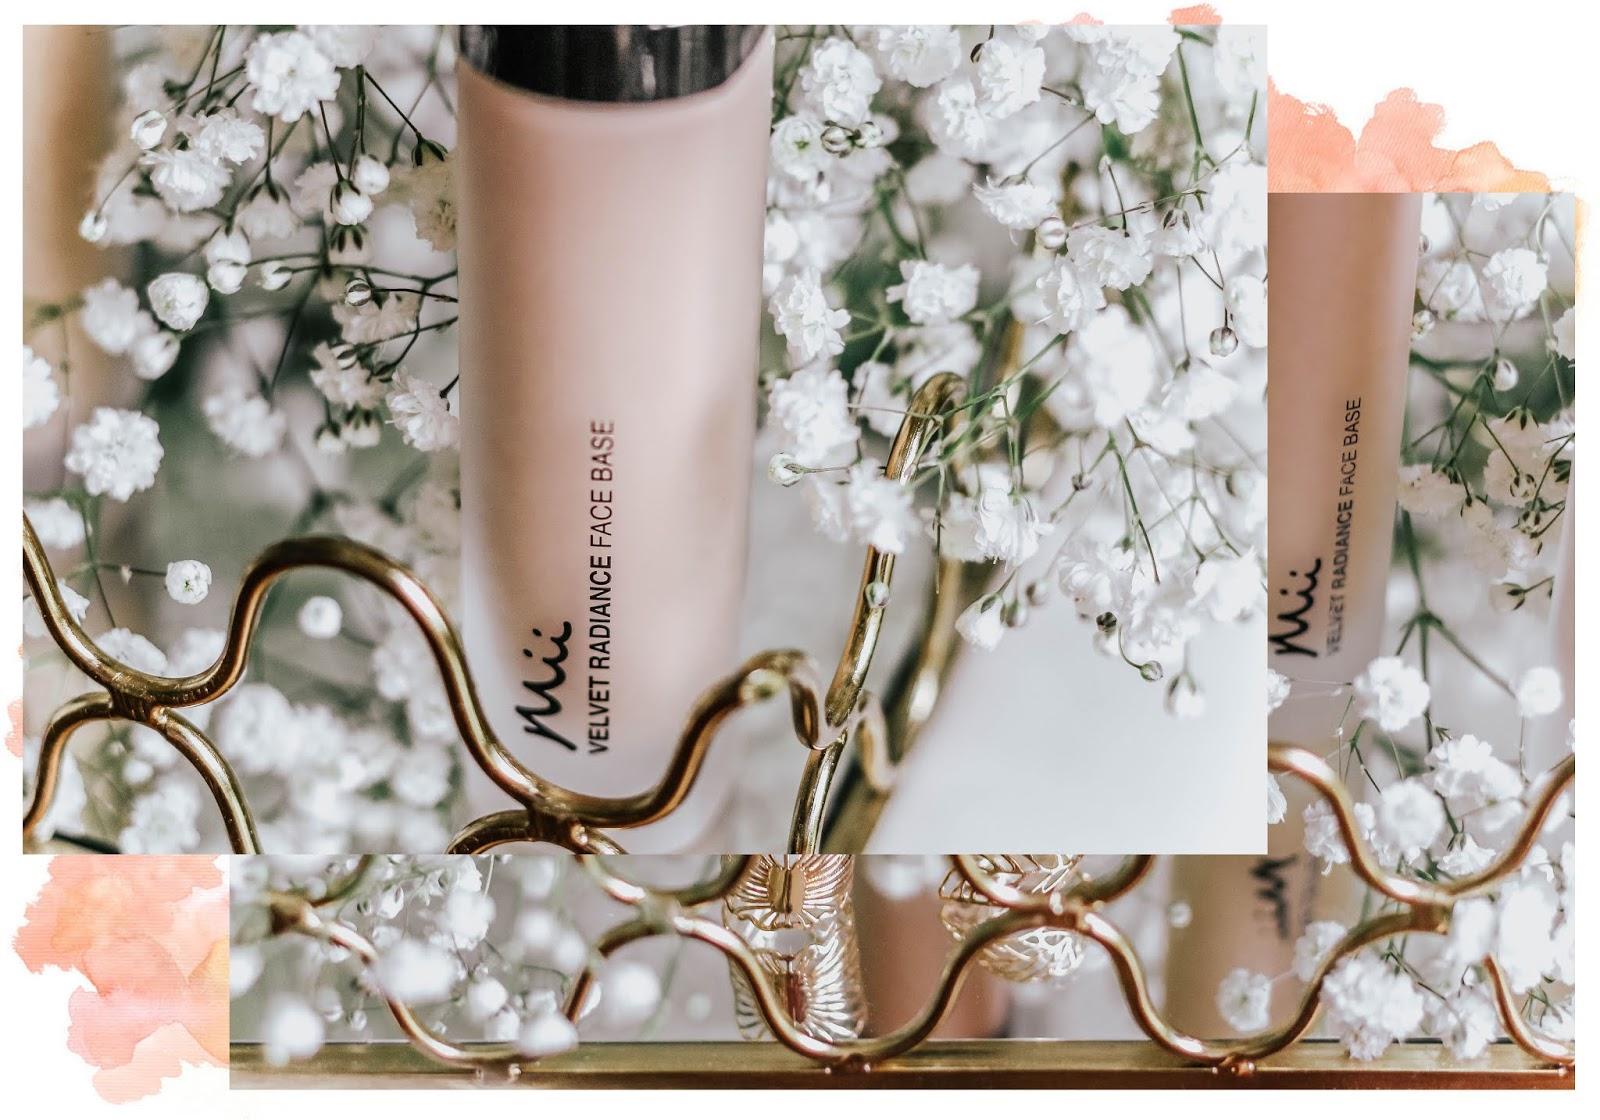 Mii Cosmetics Velvet Radiance Foundation